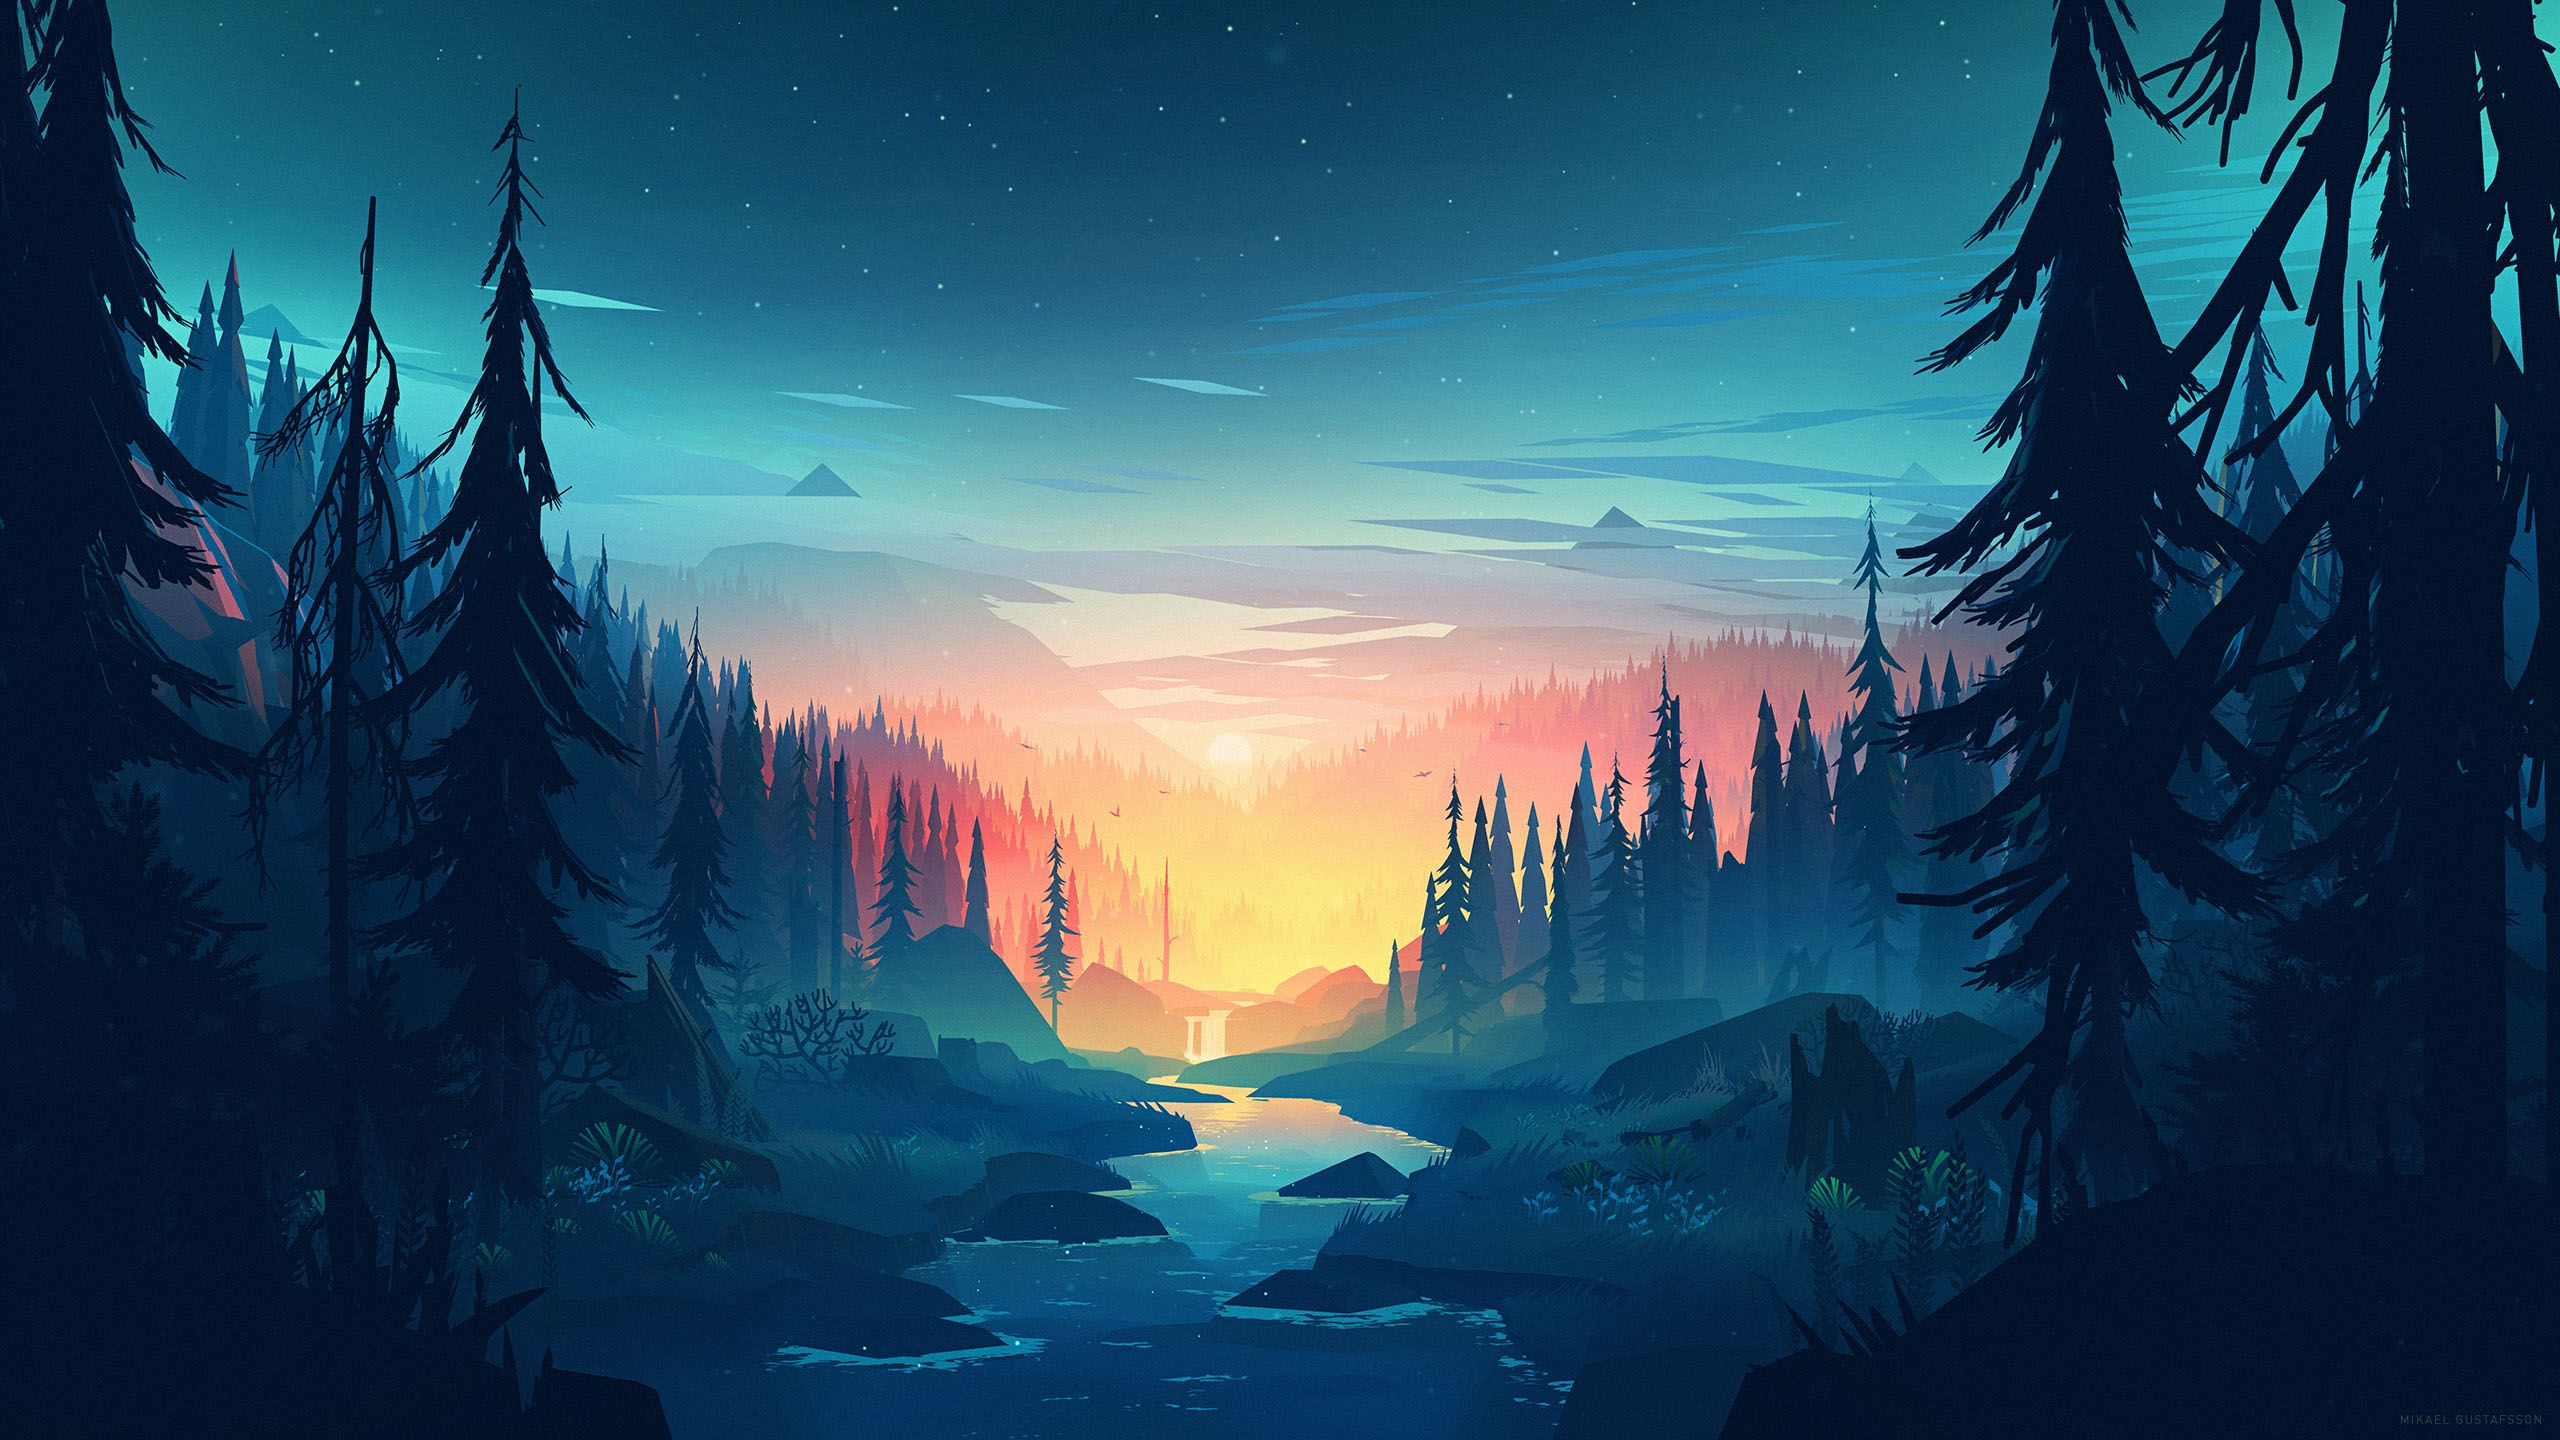 Sunset 2560x1440 Scenery Wallpaper Landscape Wallpaper Desktop Wallpaper Art